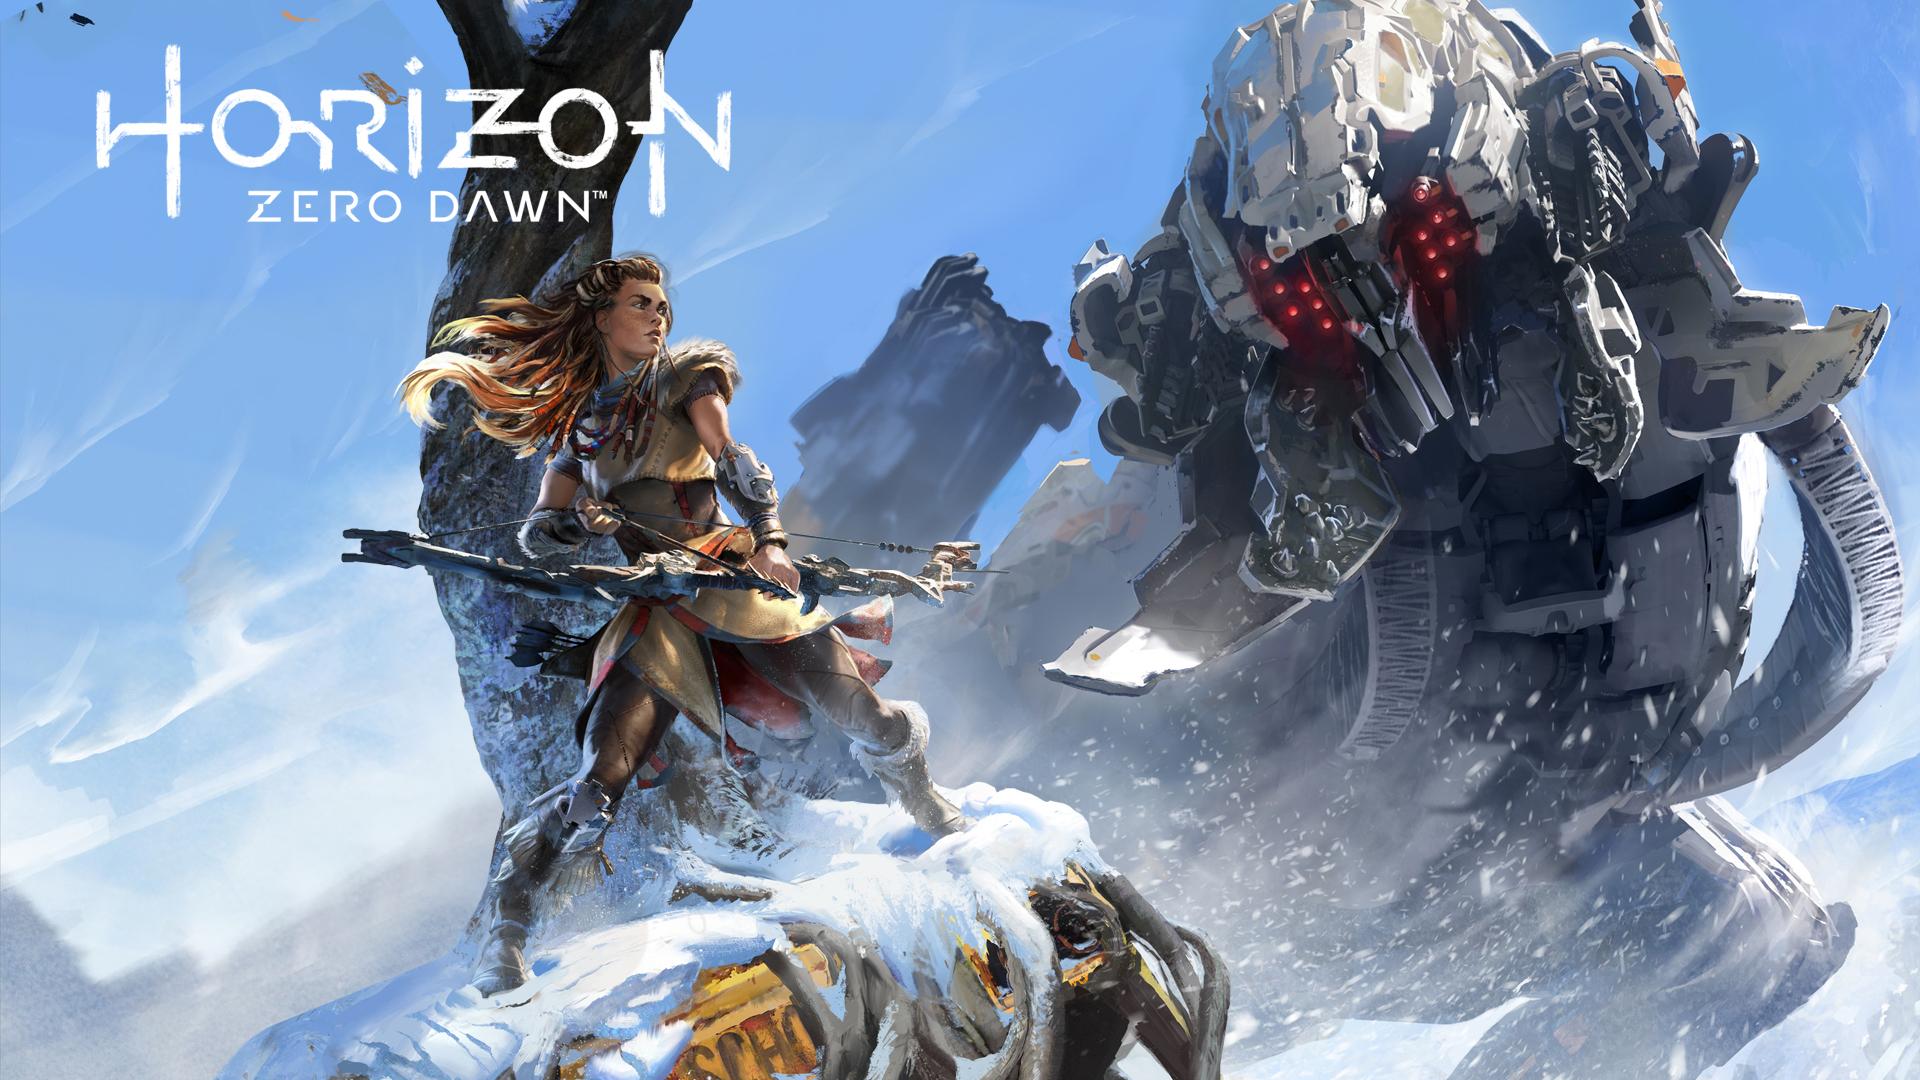 horizon zero dawn video game wallpaper 48904